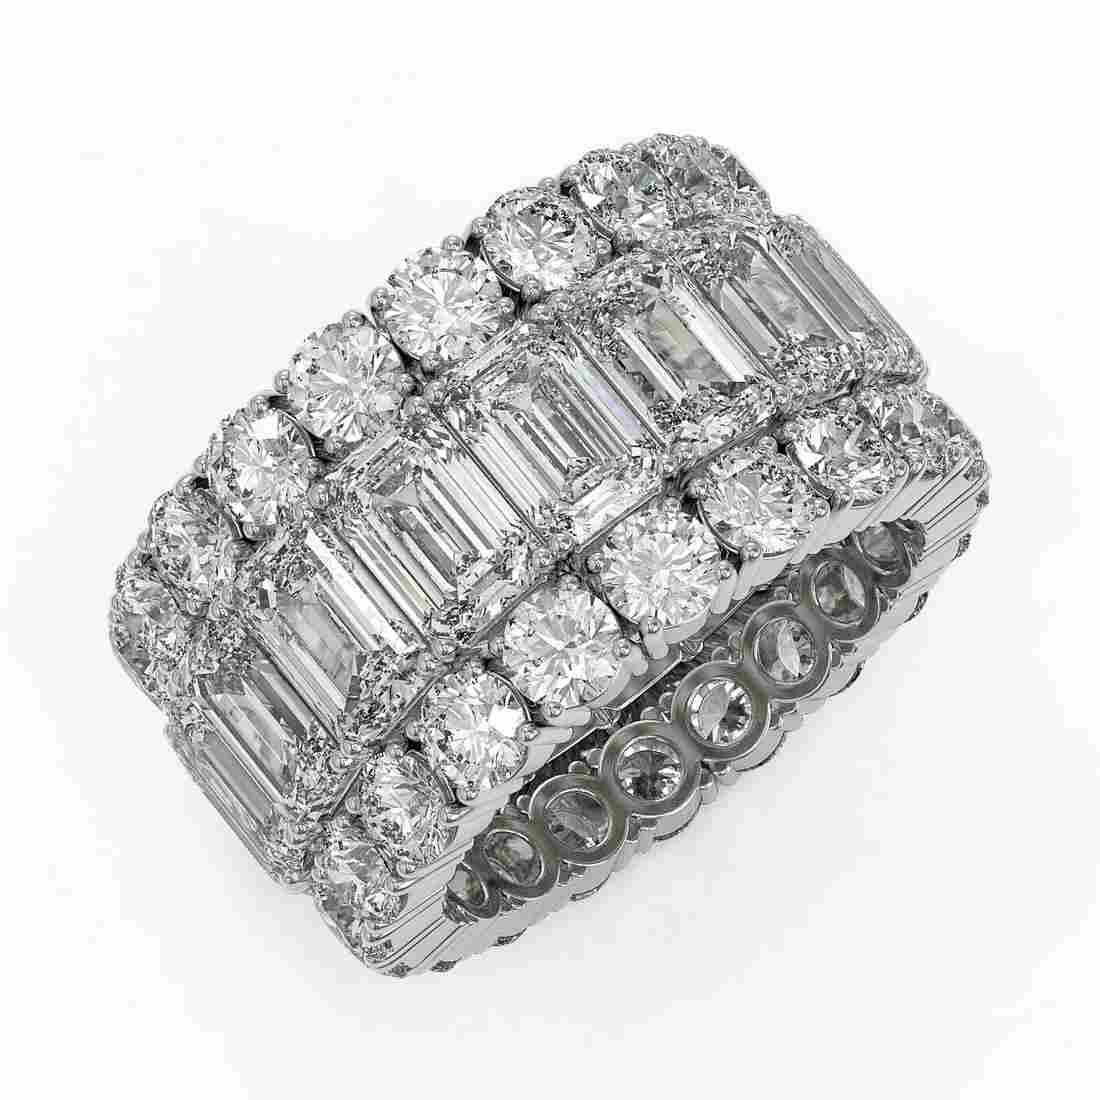 13.87 ctw Emerald Cut Diamond Eternity Ring 18K White